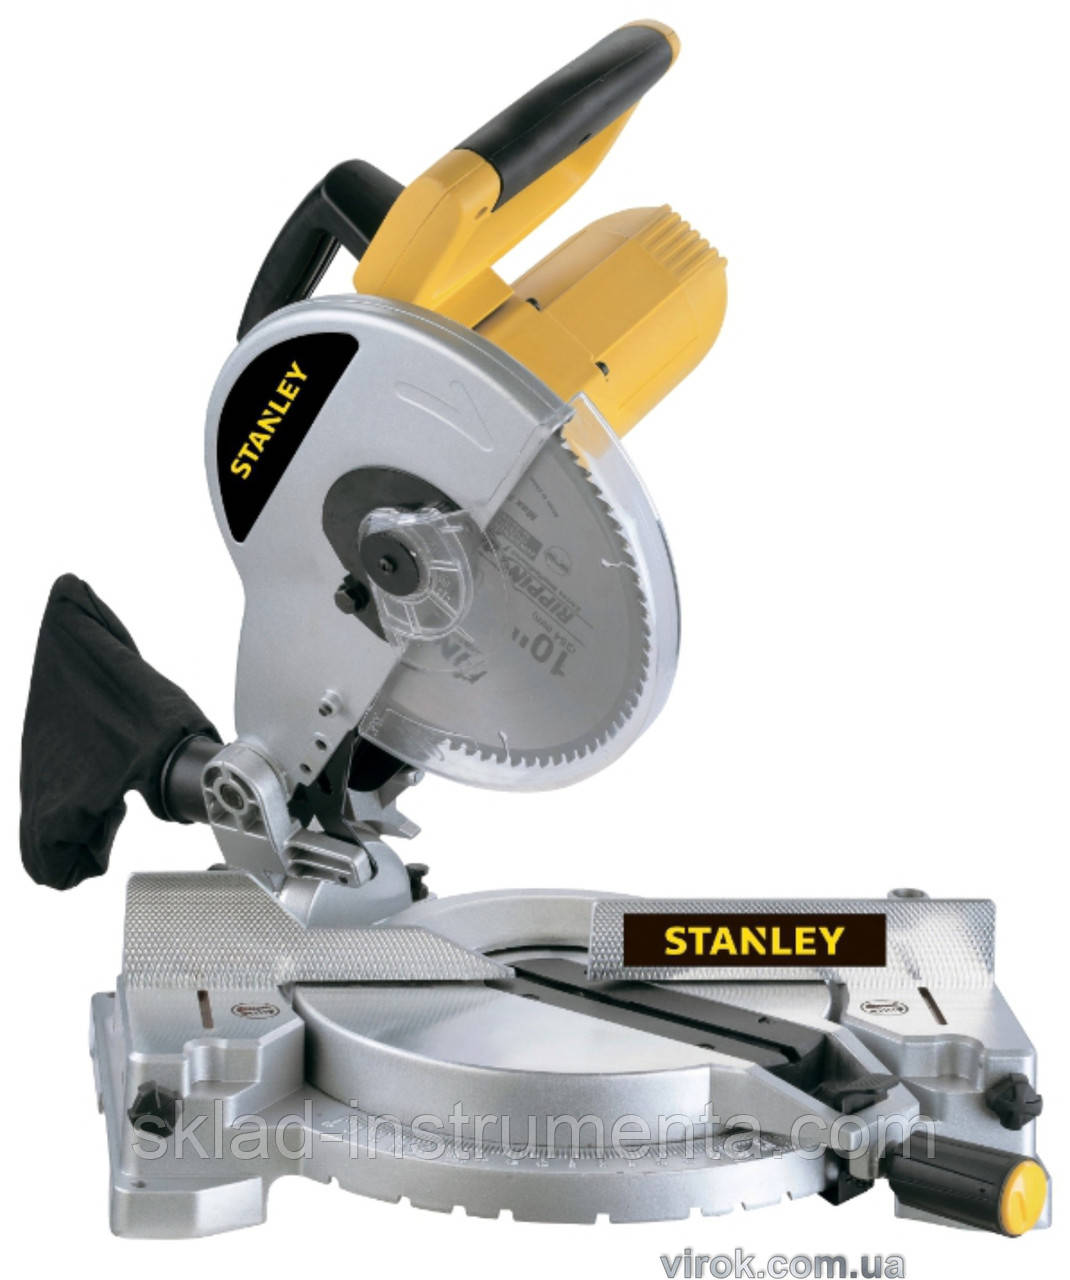 Пила торцеві STANLEY 1500 Вт диск 255 мм